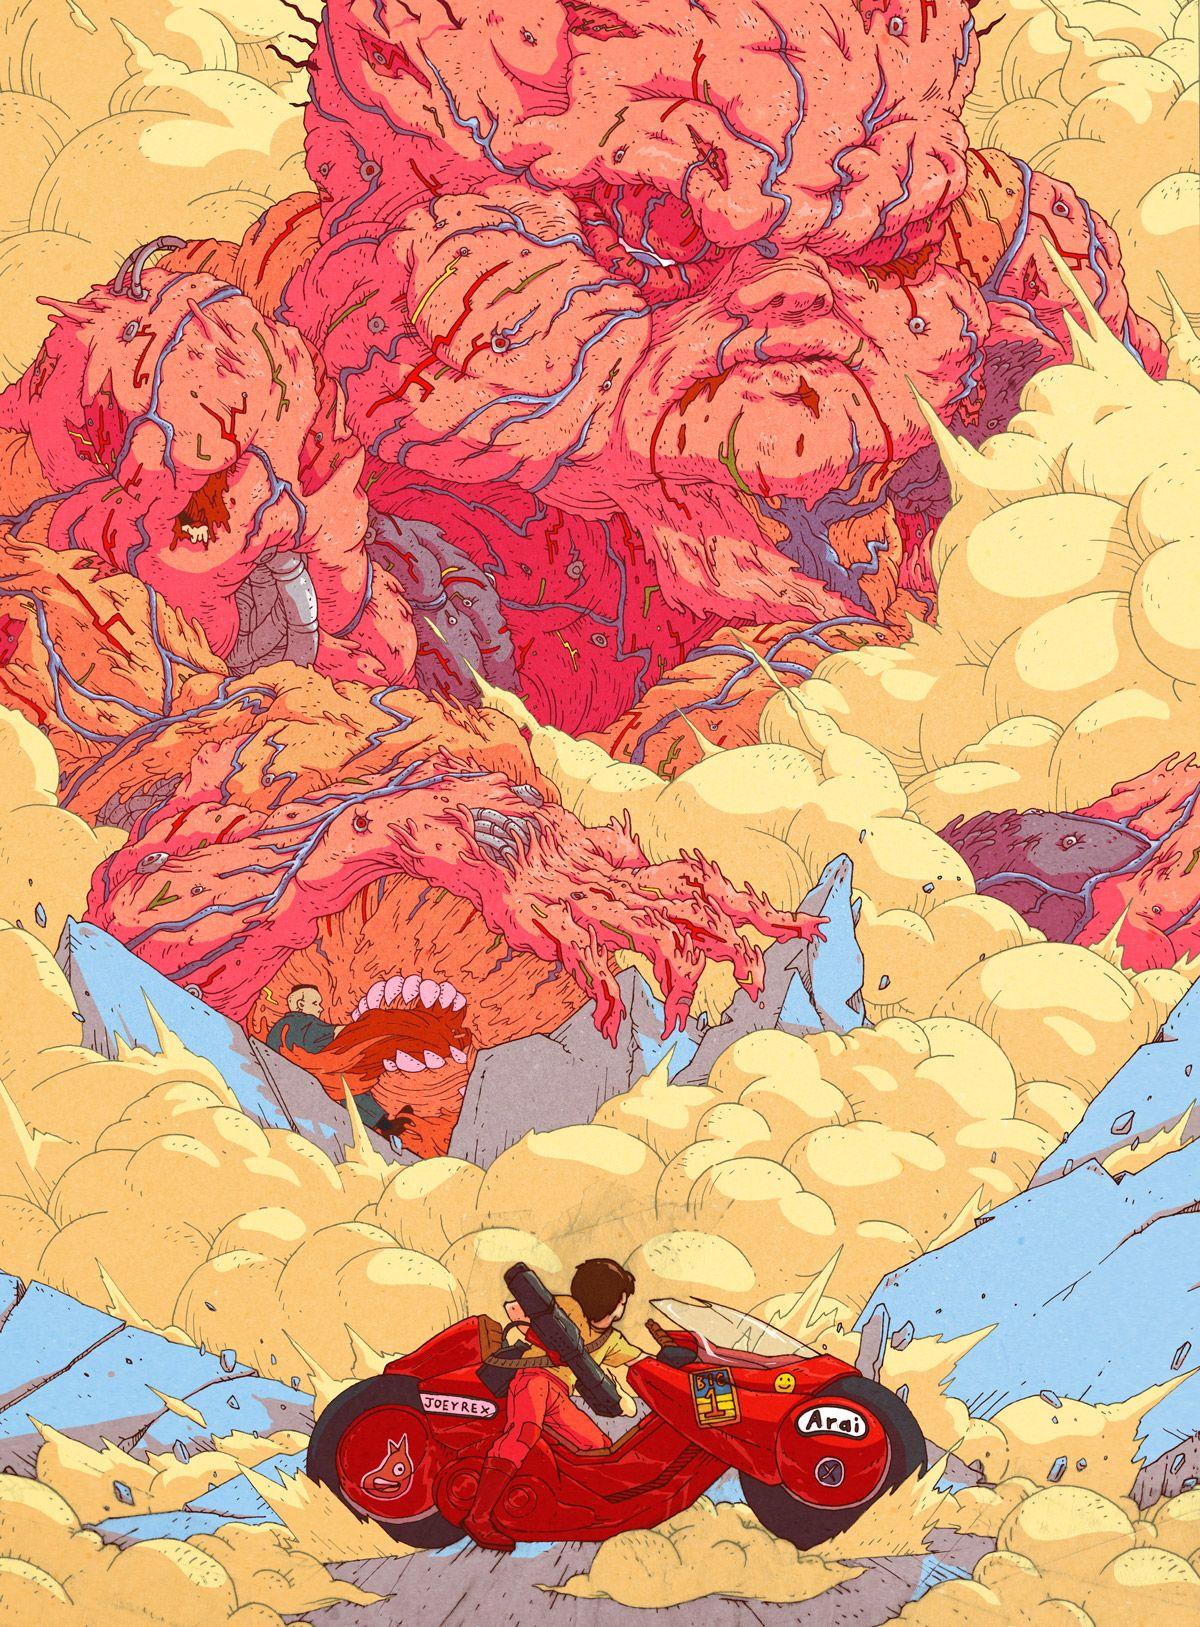 Iamjoeyrex Final Boss Tetsuo Akira Anime Scifi Fantasy Art Art